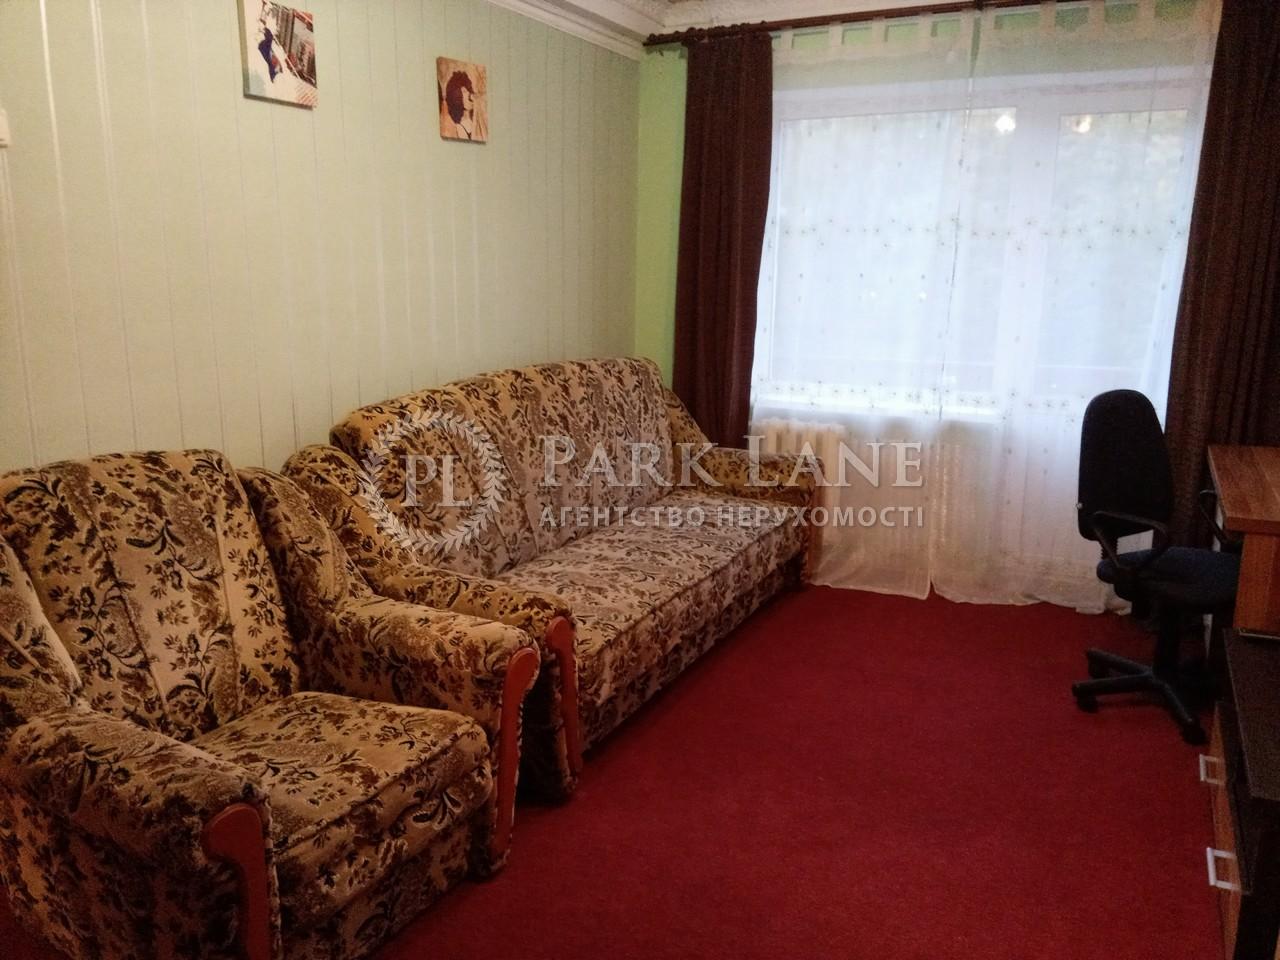 Квартира ул. Сеченова, 10 корпус 2, Киев, Z-1688081 - Фото 4